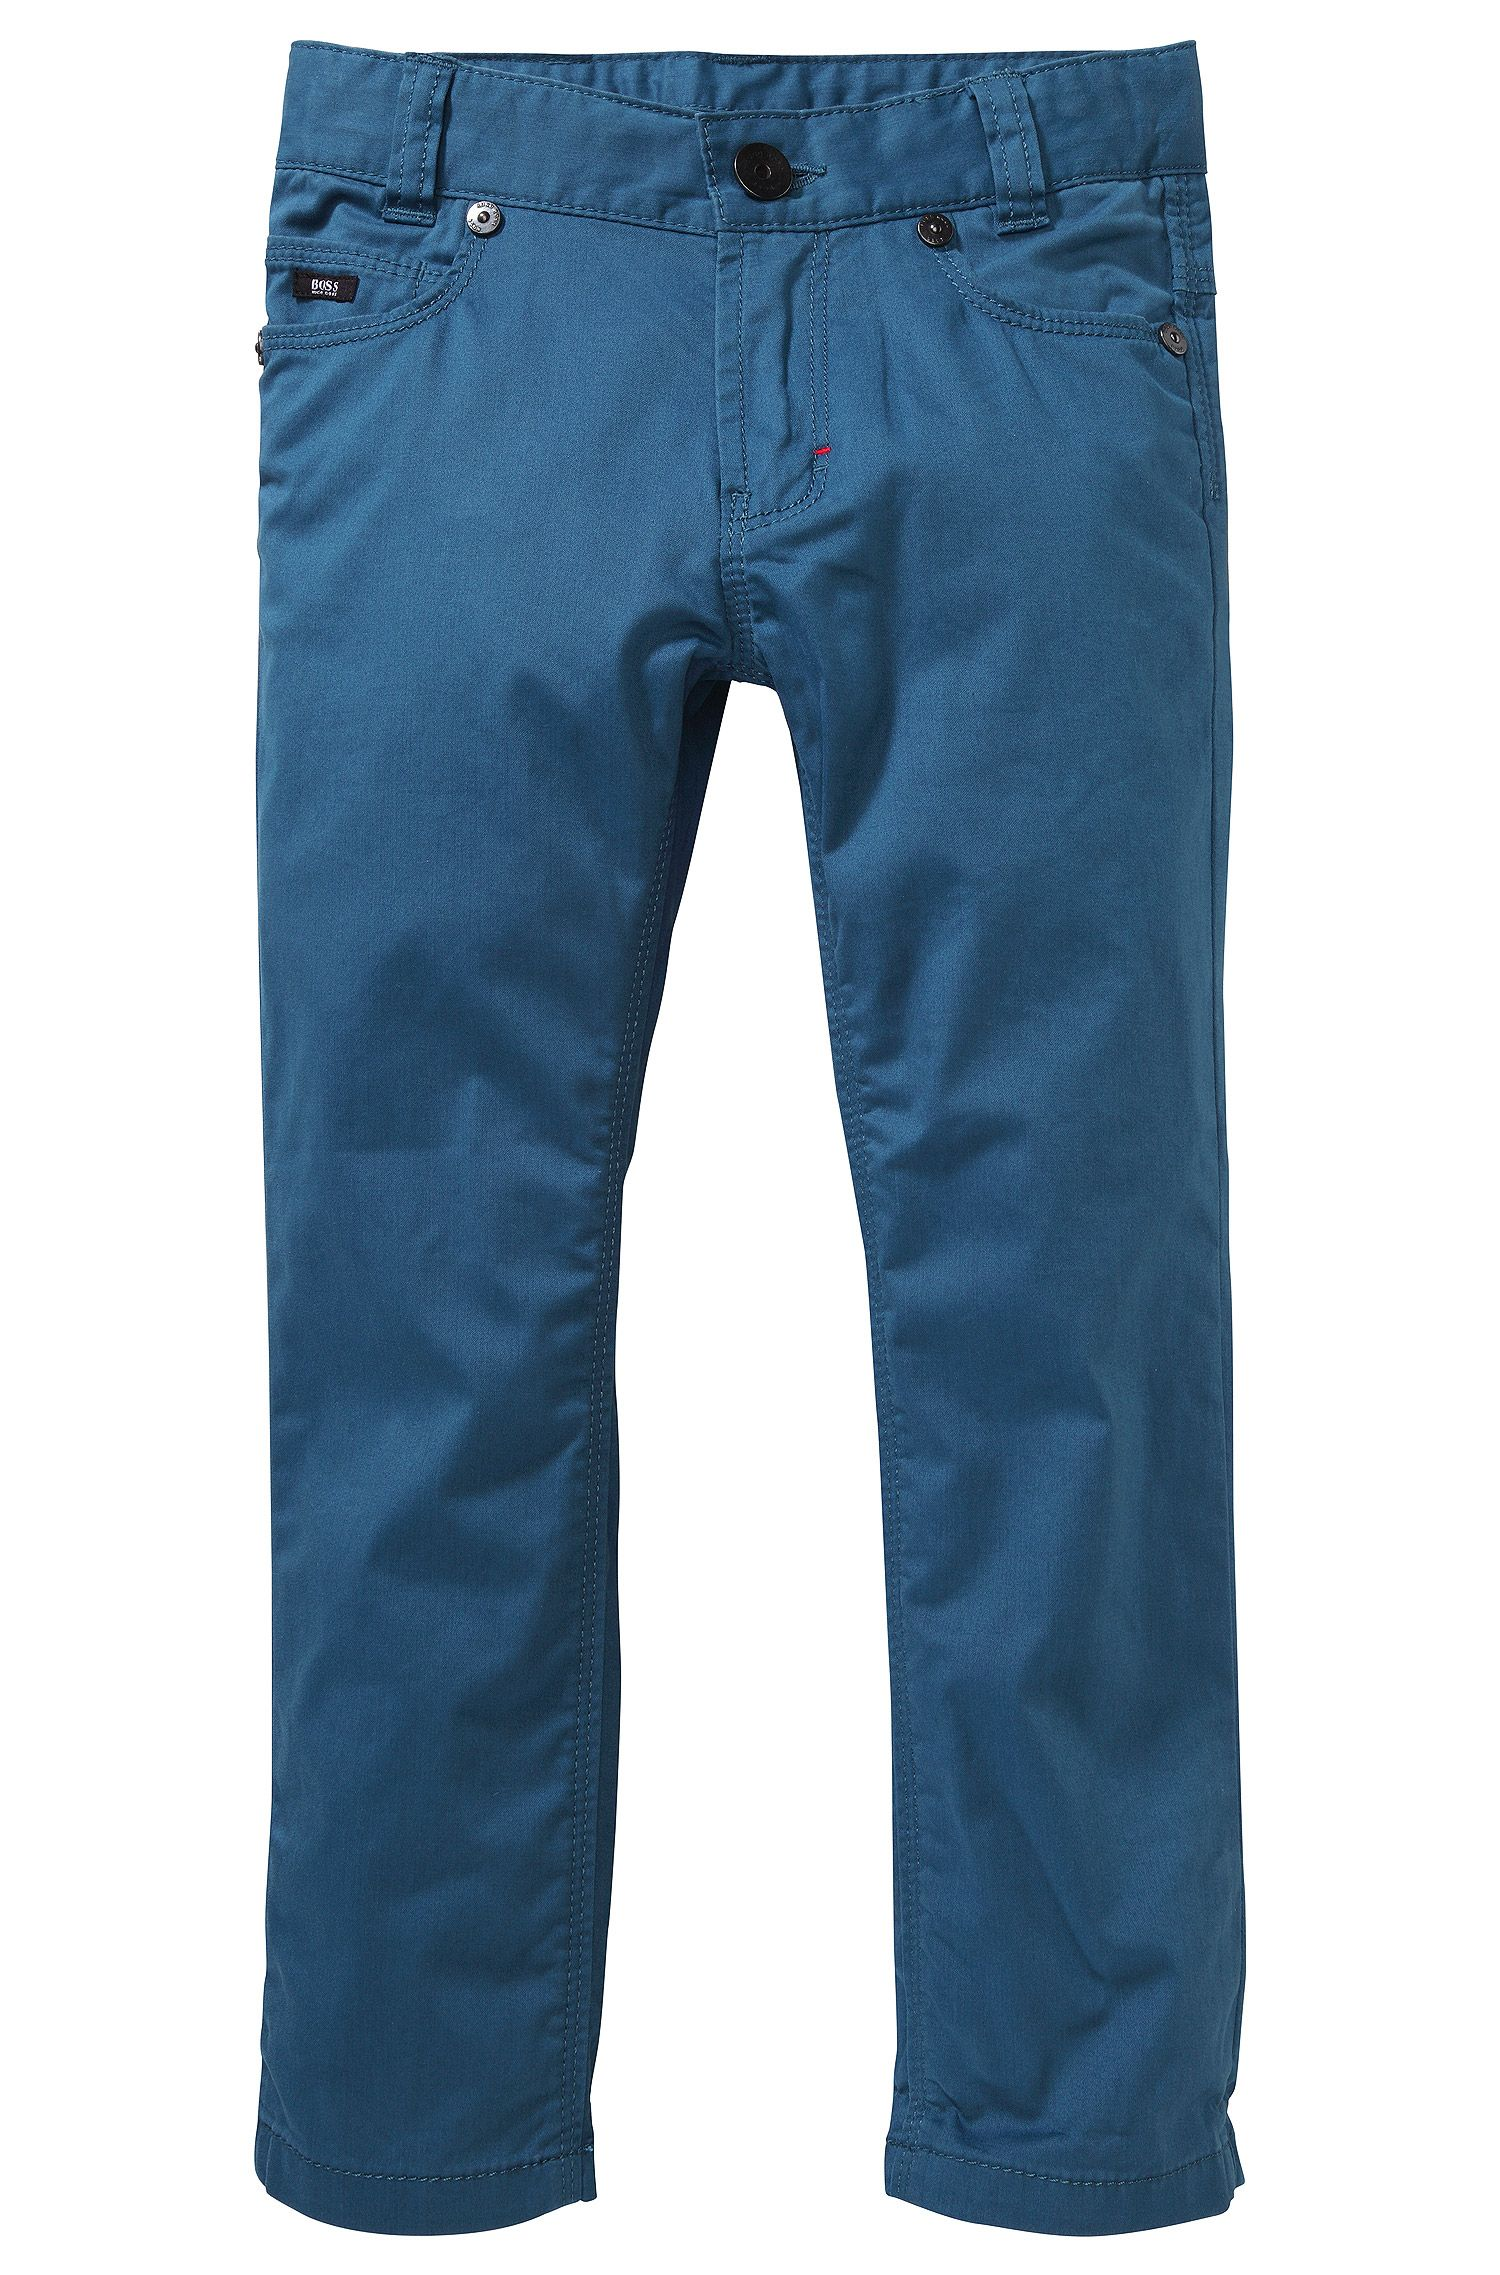 Kids-Jeans ´J24326` mit verstellbarem Gummiband